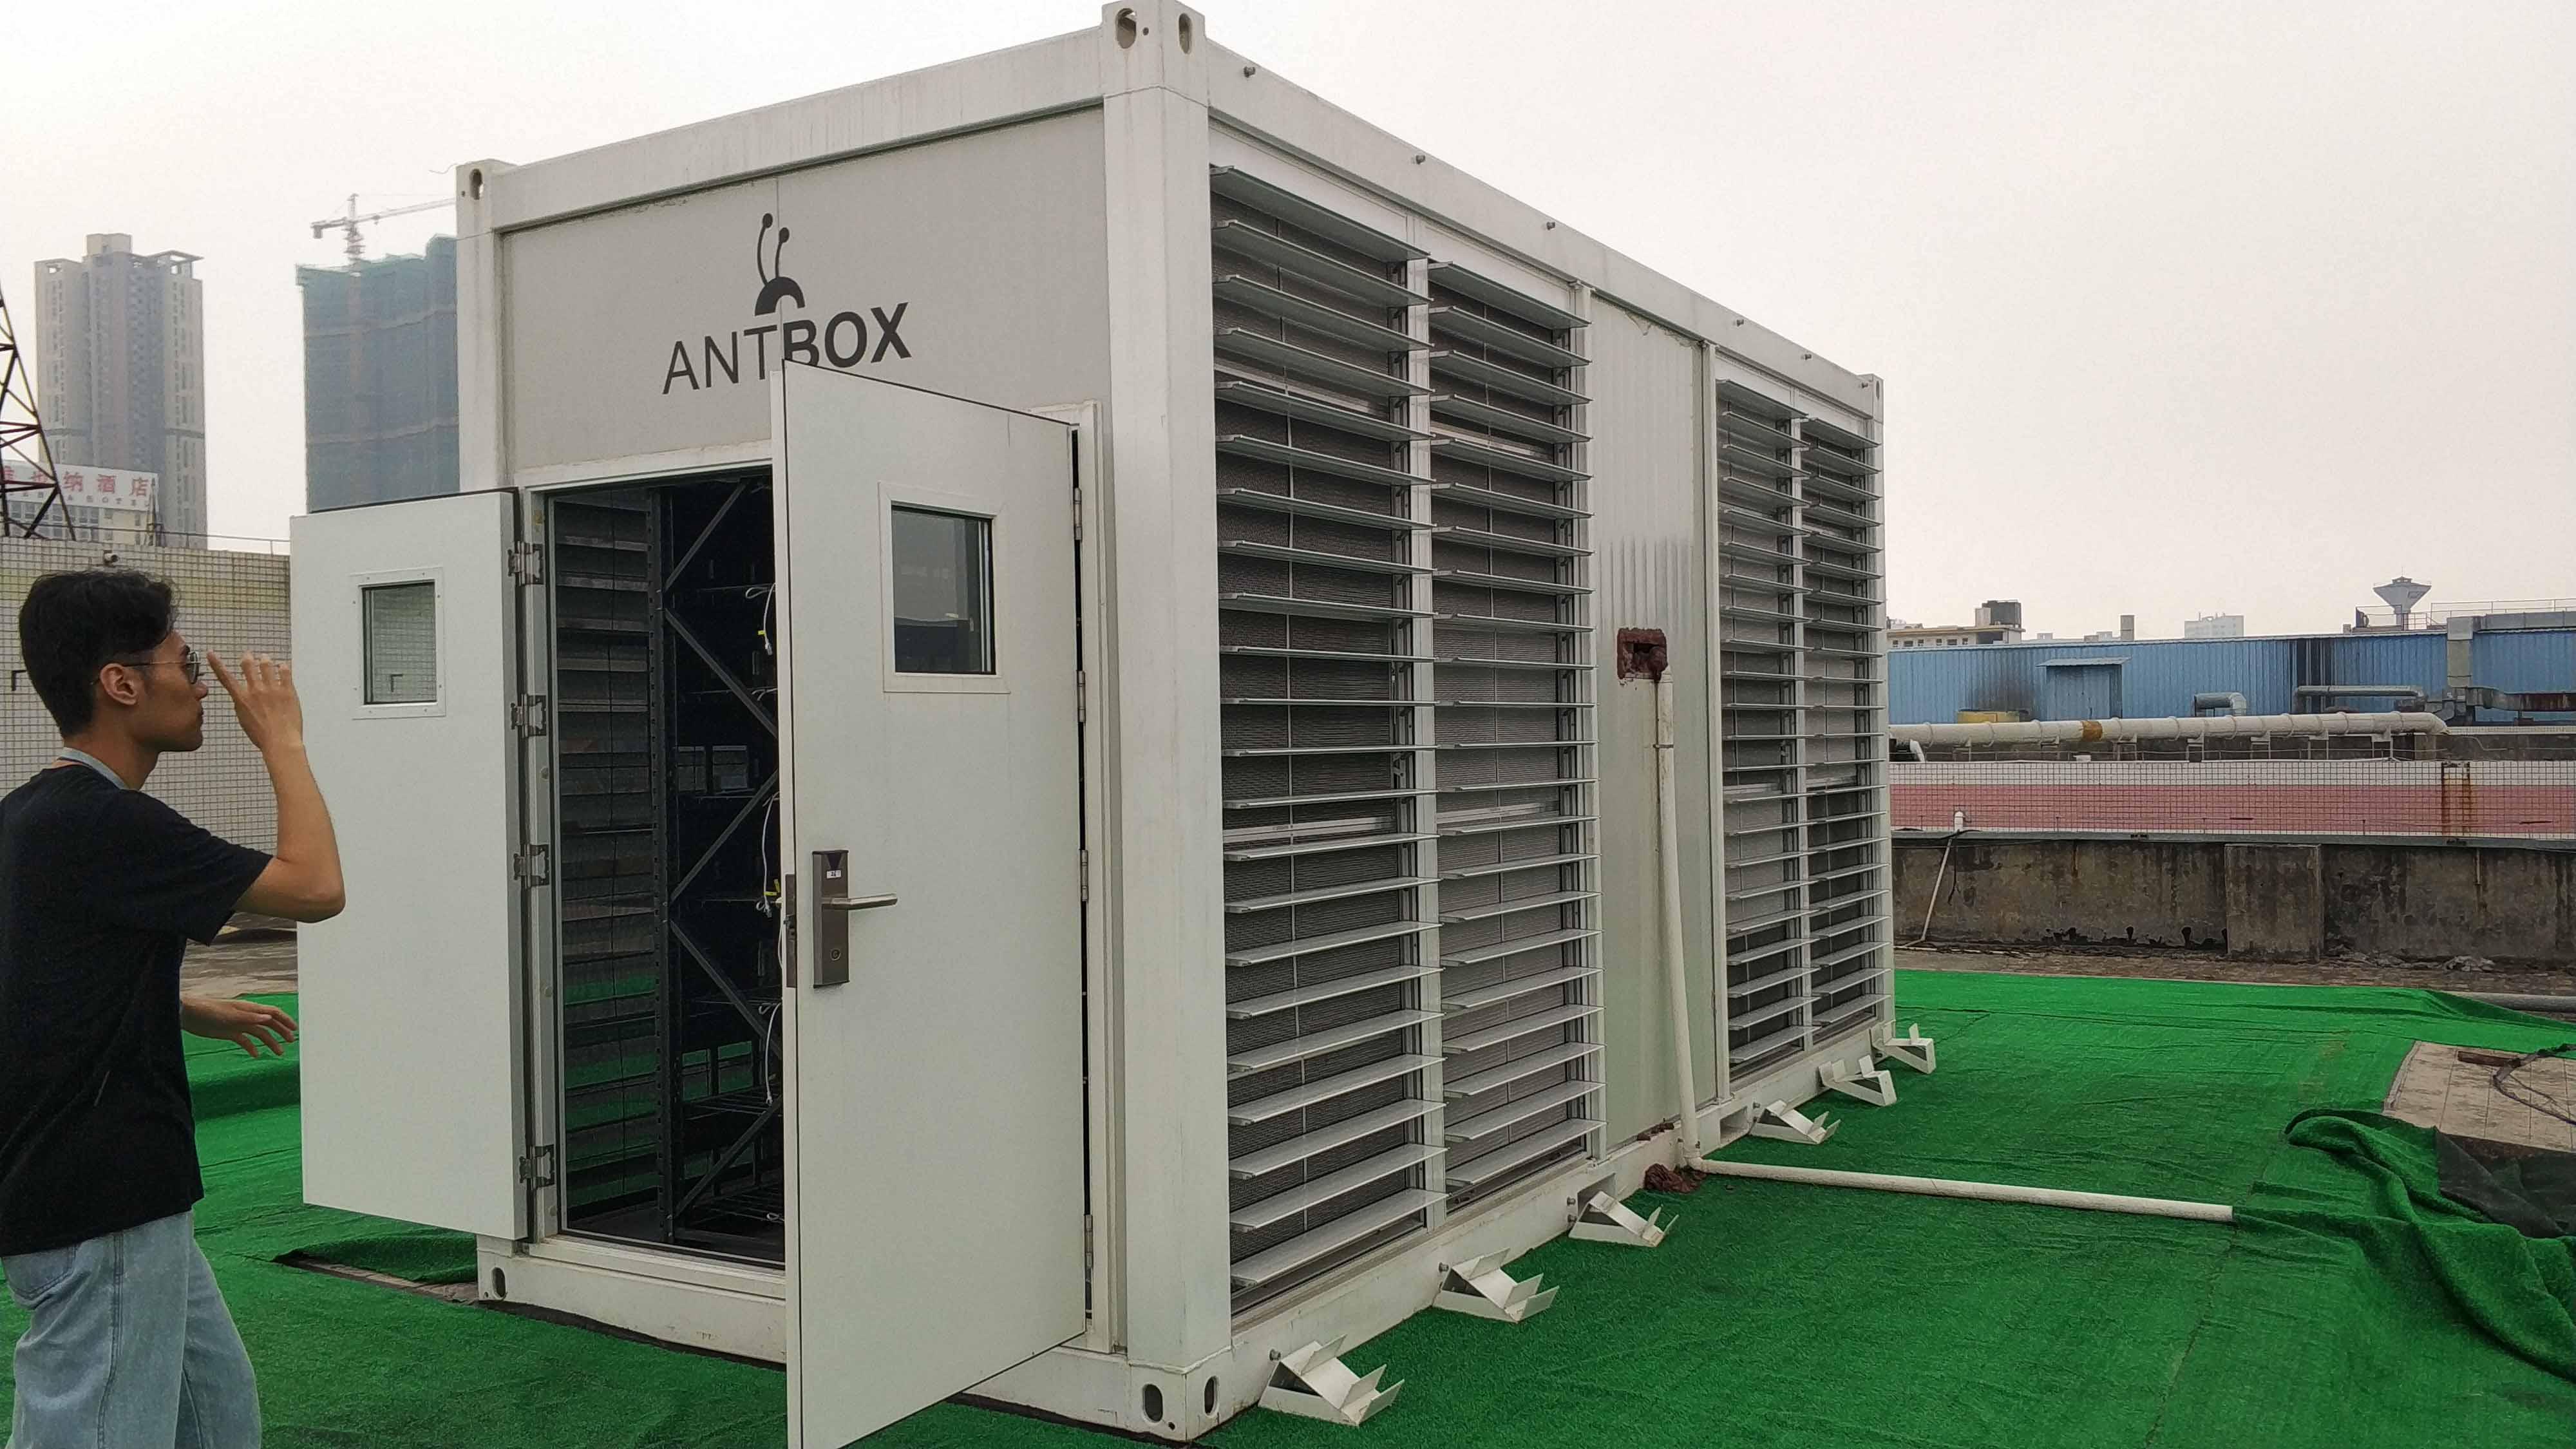 antbox_03.jpg